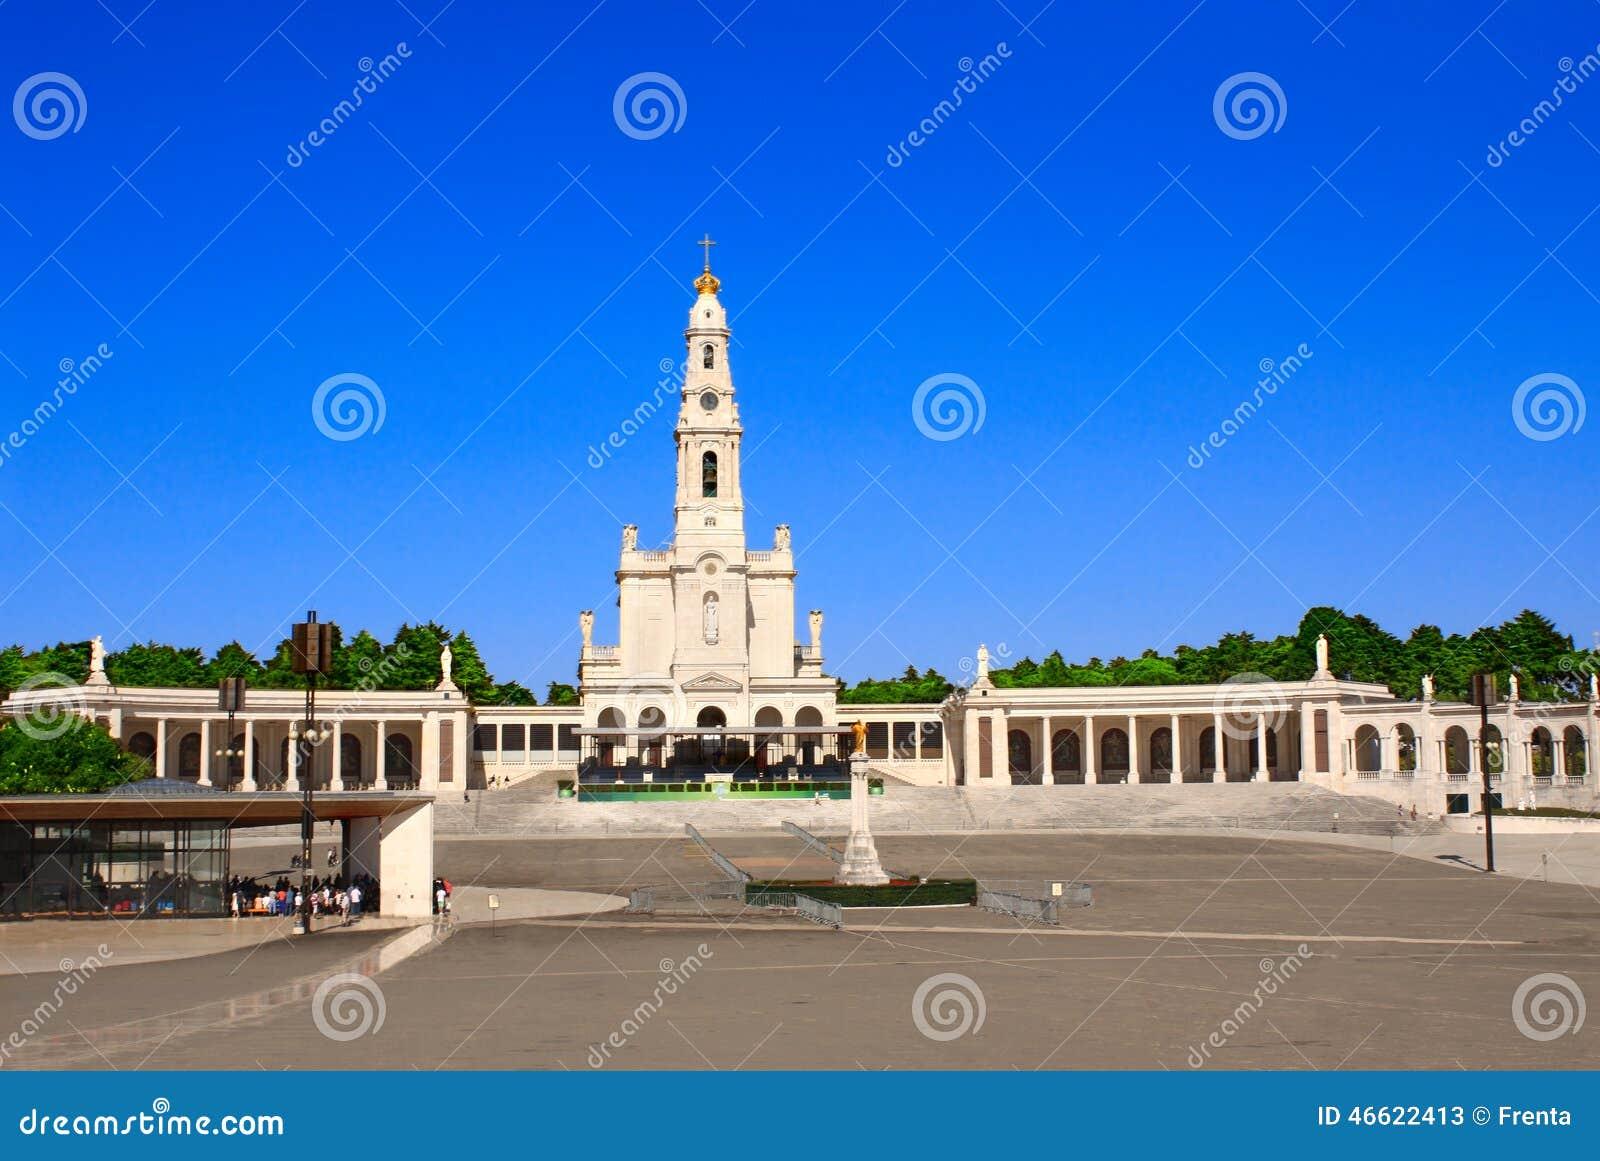 Schongebiet unserer Dame, Fatima, Portugal